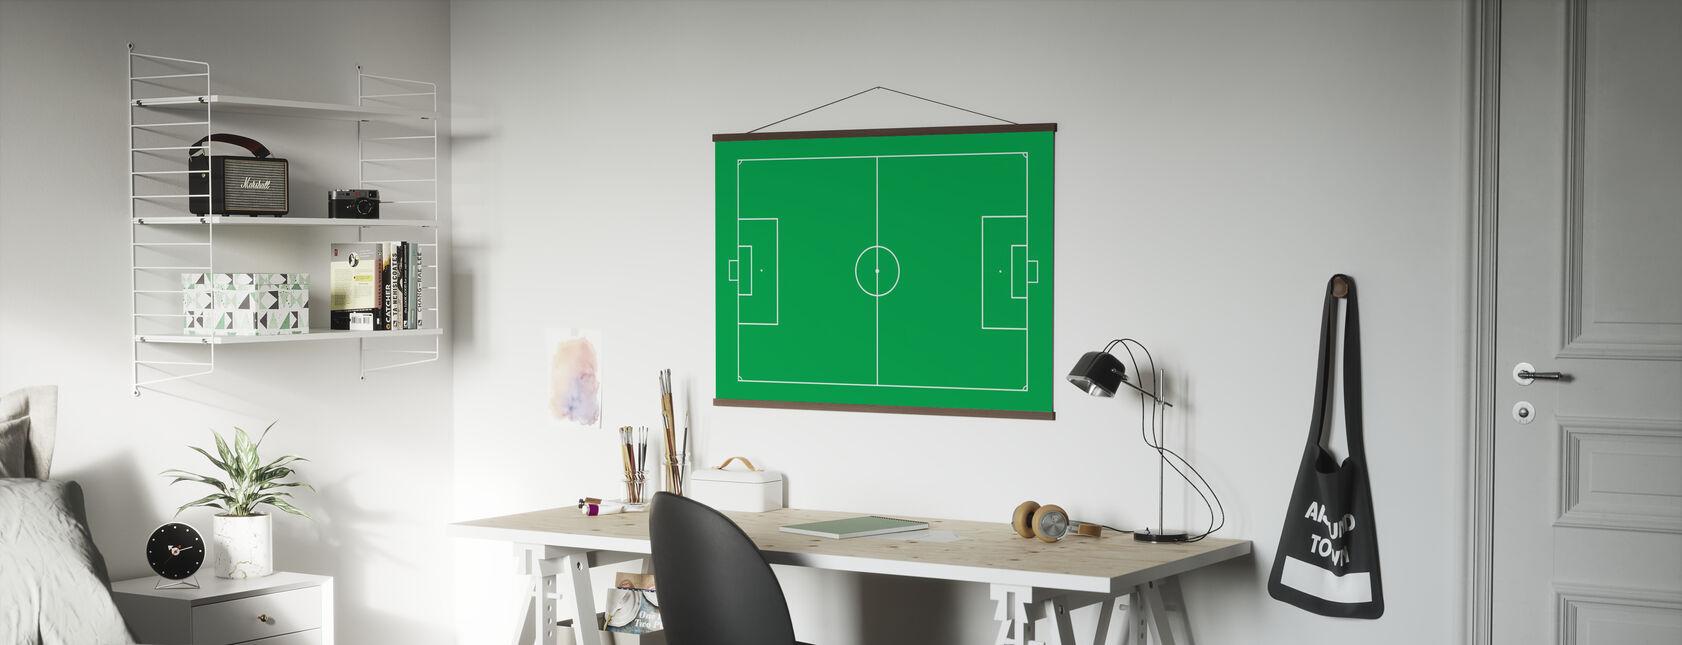 Soccer Field - Poster - Office